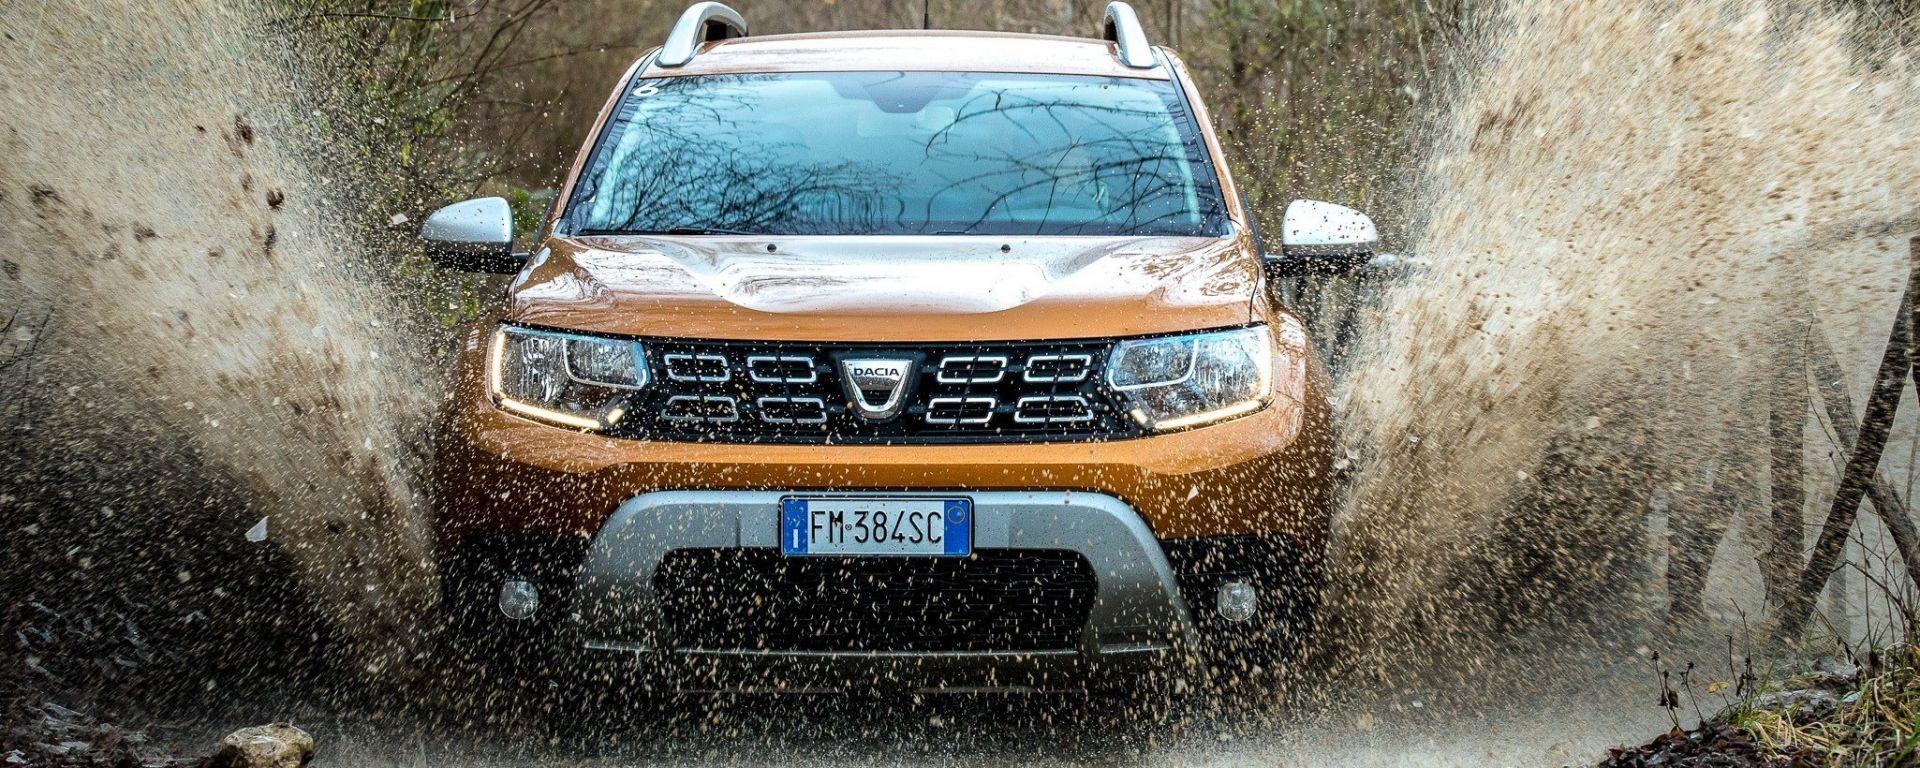 Dacia Duster 1.3 TCe 4x4